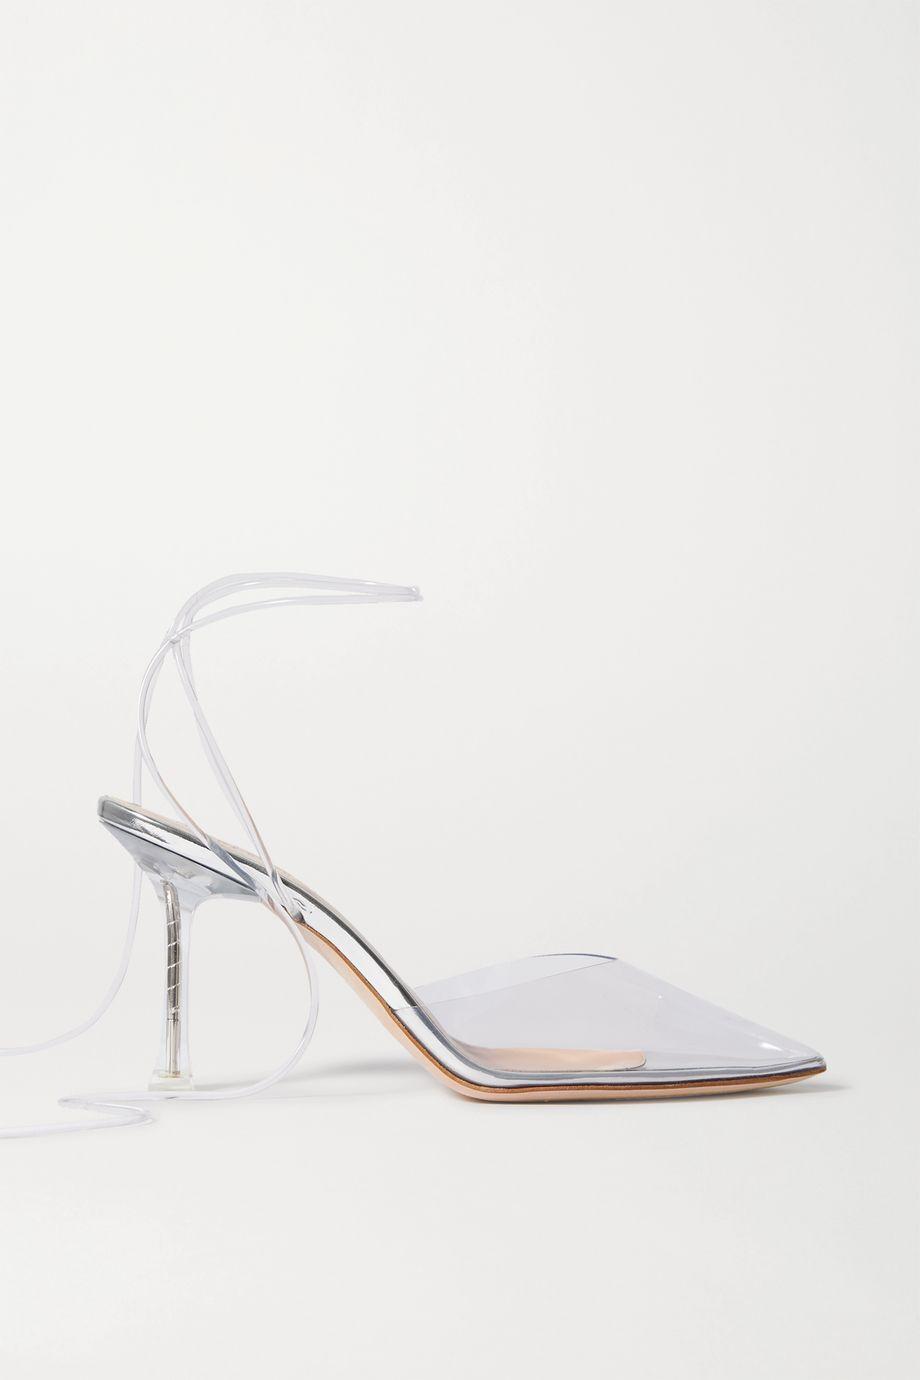 Magda Butrym Finland crystal-embellished PVC pumps